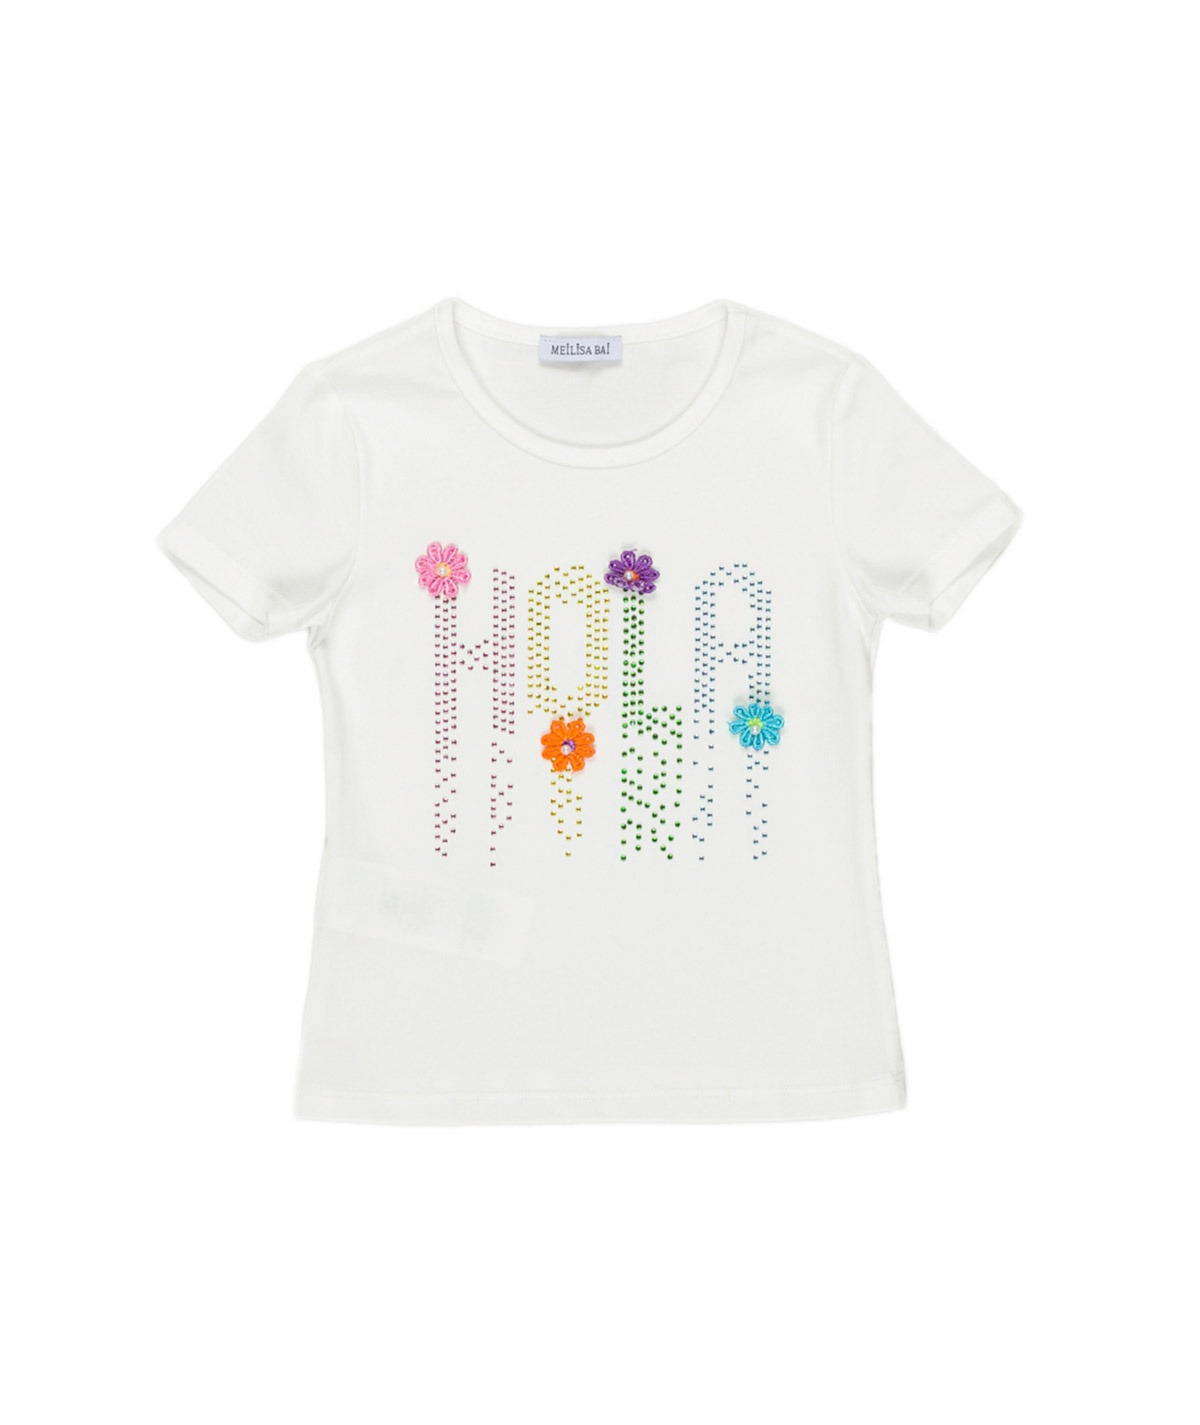 T-shirt Meilisa Bai MEILISA BAI   T-shirt   FL3043